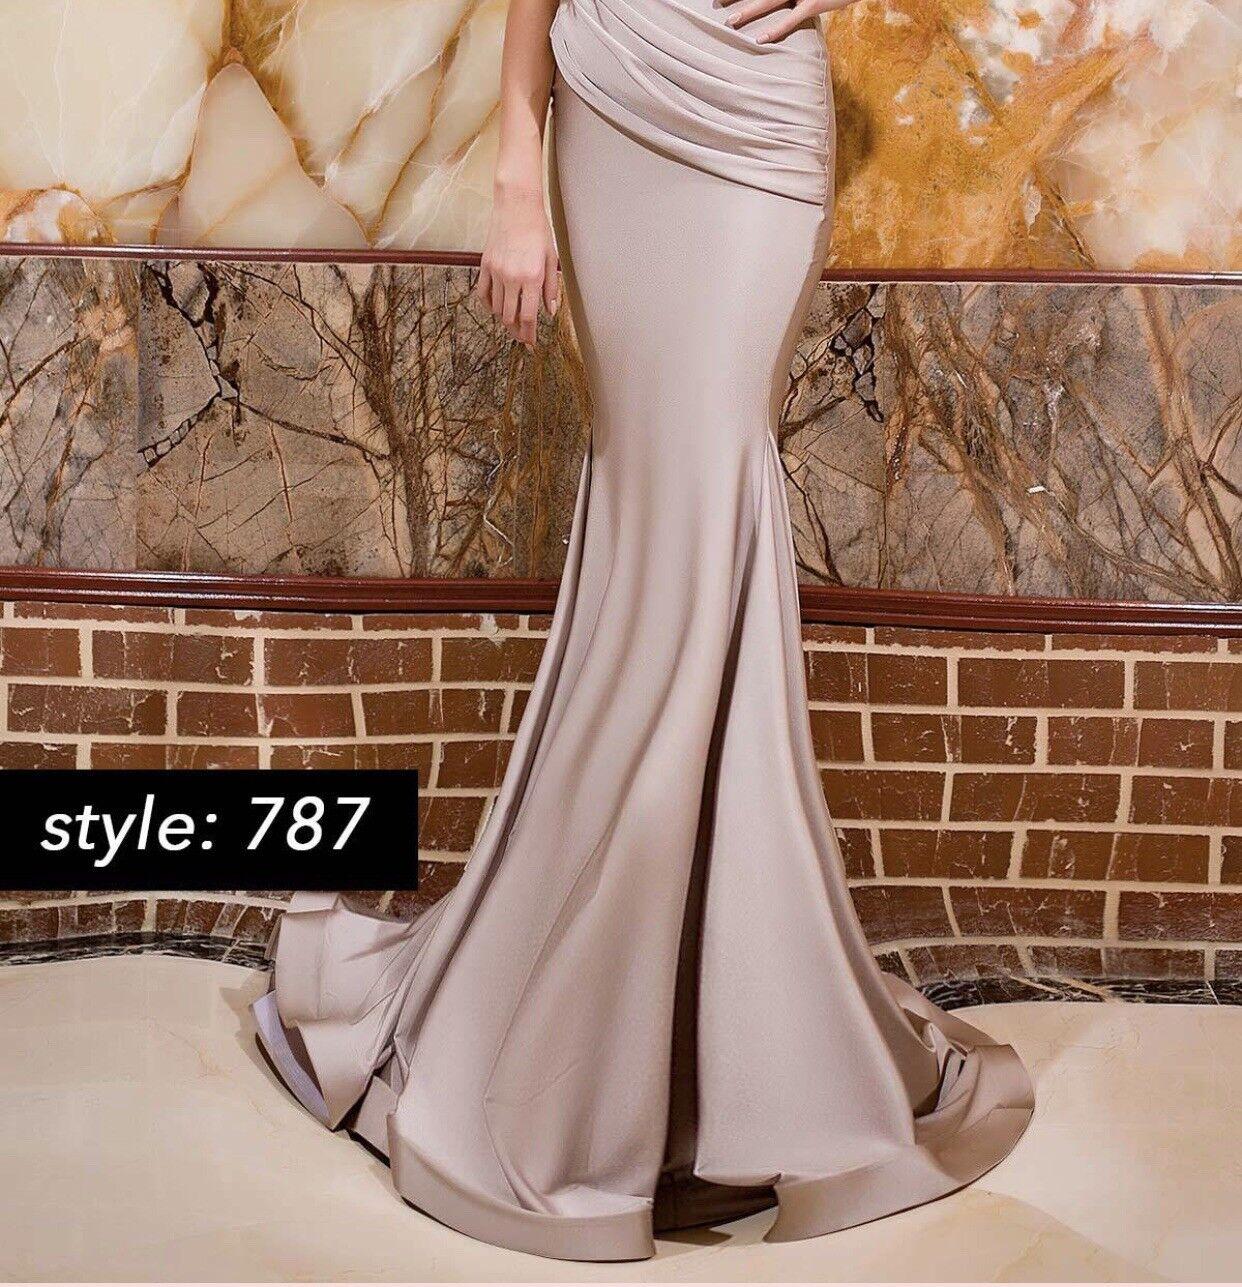 Jessica Angel Dress Style 787- Mauve  bluesh color Long Stretch Satin Dress